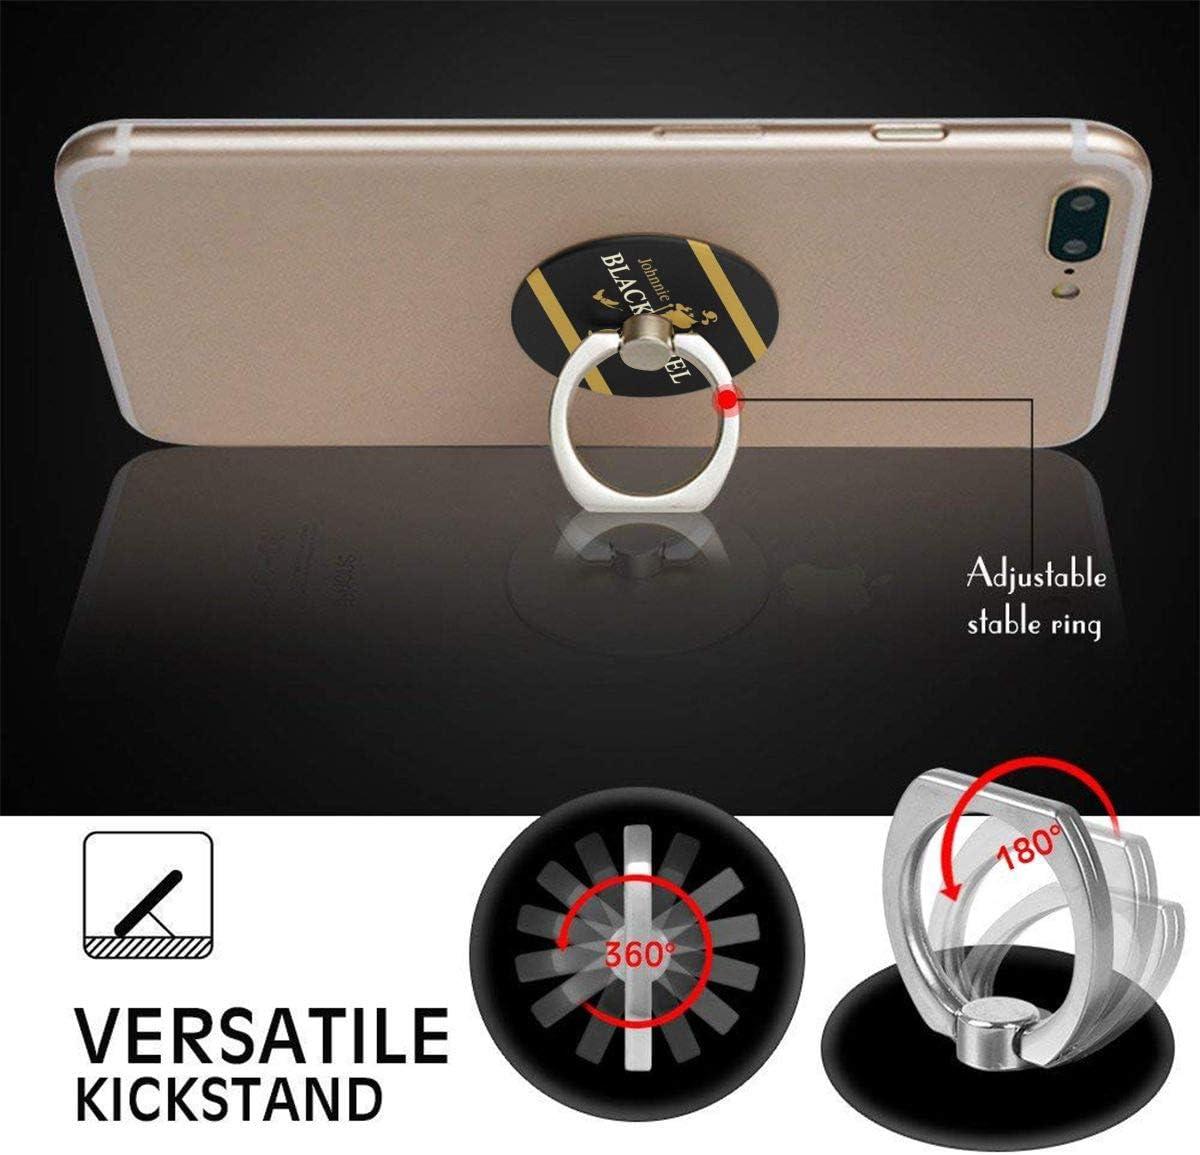 CyBlackwoodnara Johnnie Walker 360 Degree Rotating Finger Ring Stand Holder Phone Holder for Any Smartphones iPhone Or Tablets